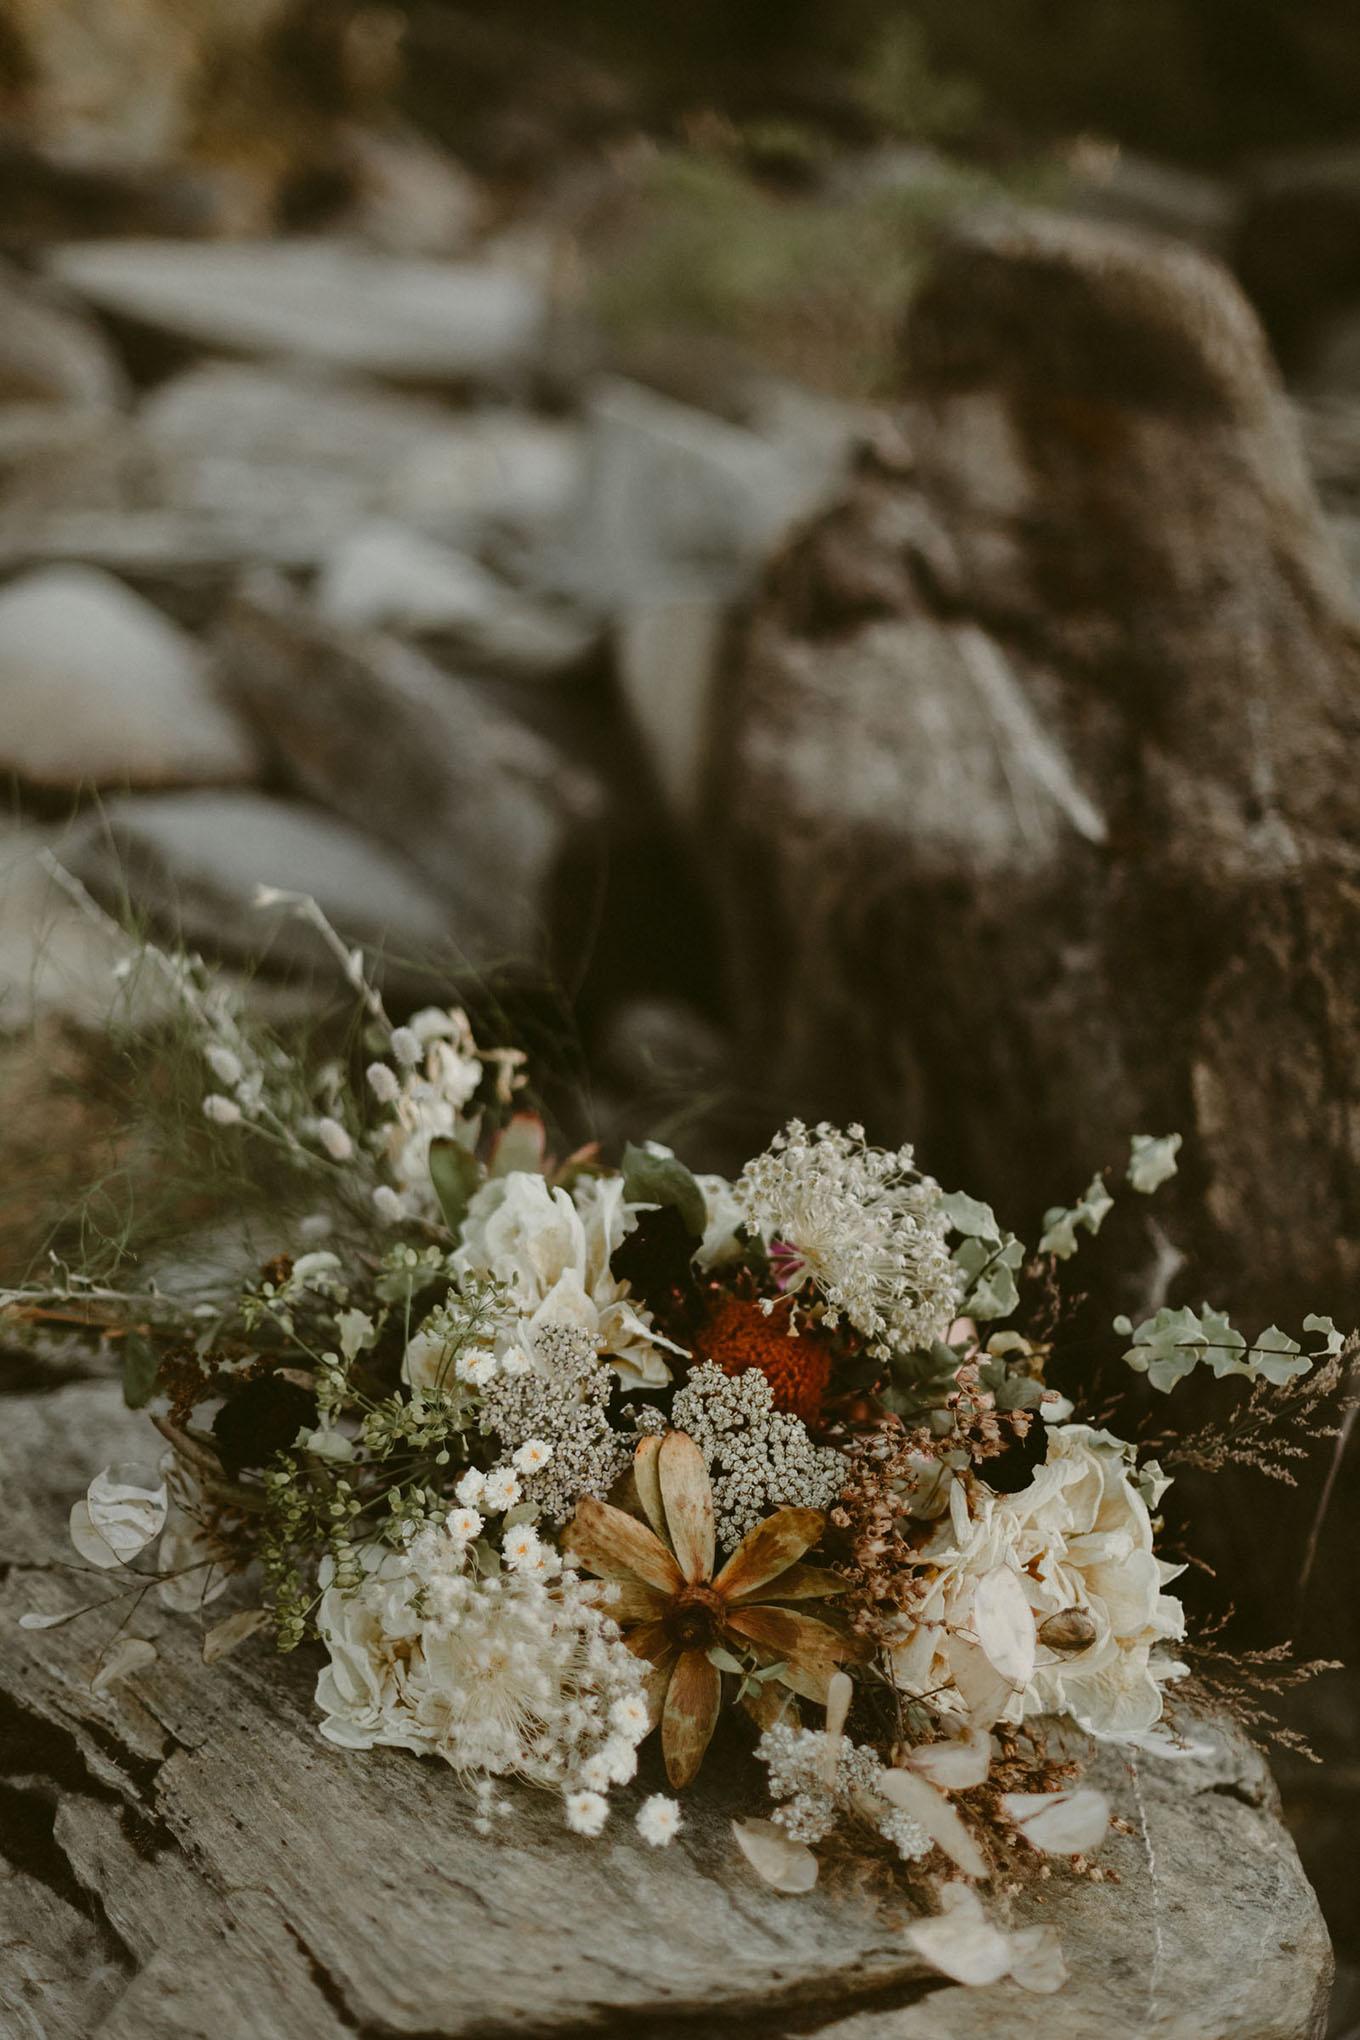 Categories: Inspiration-Wilderness